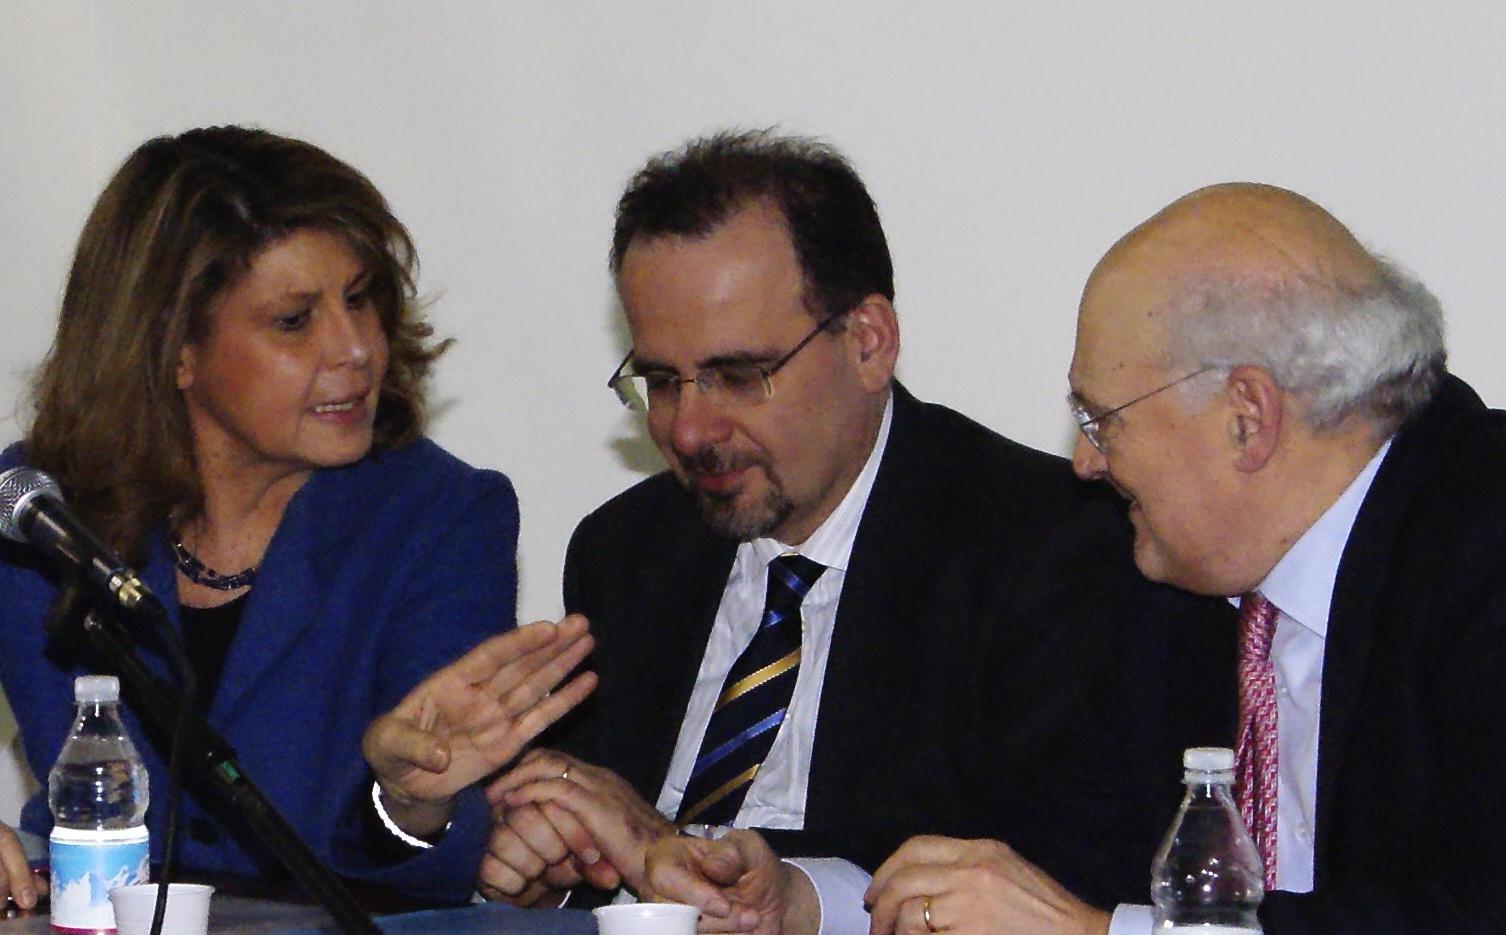 Luca Jahier insieme a Silvia Costa e Stefano Zamagni